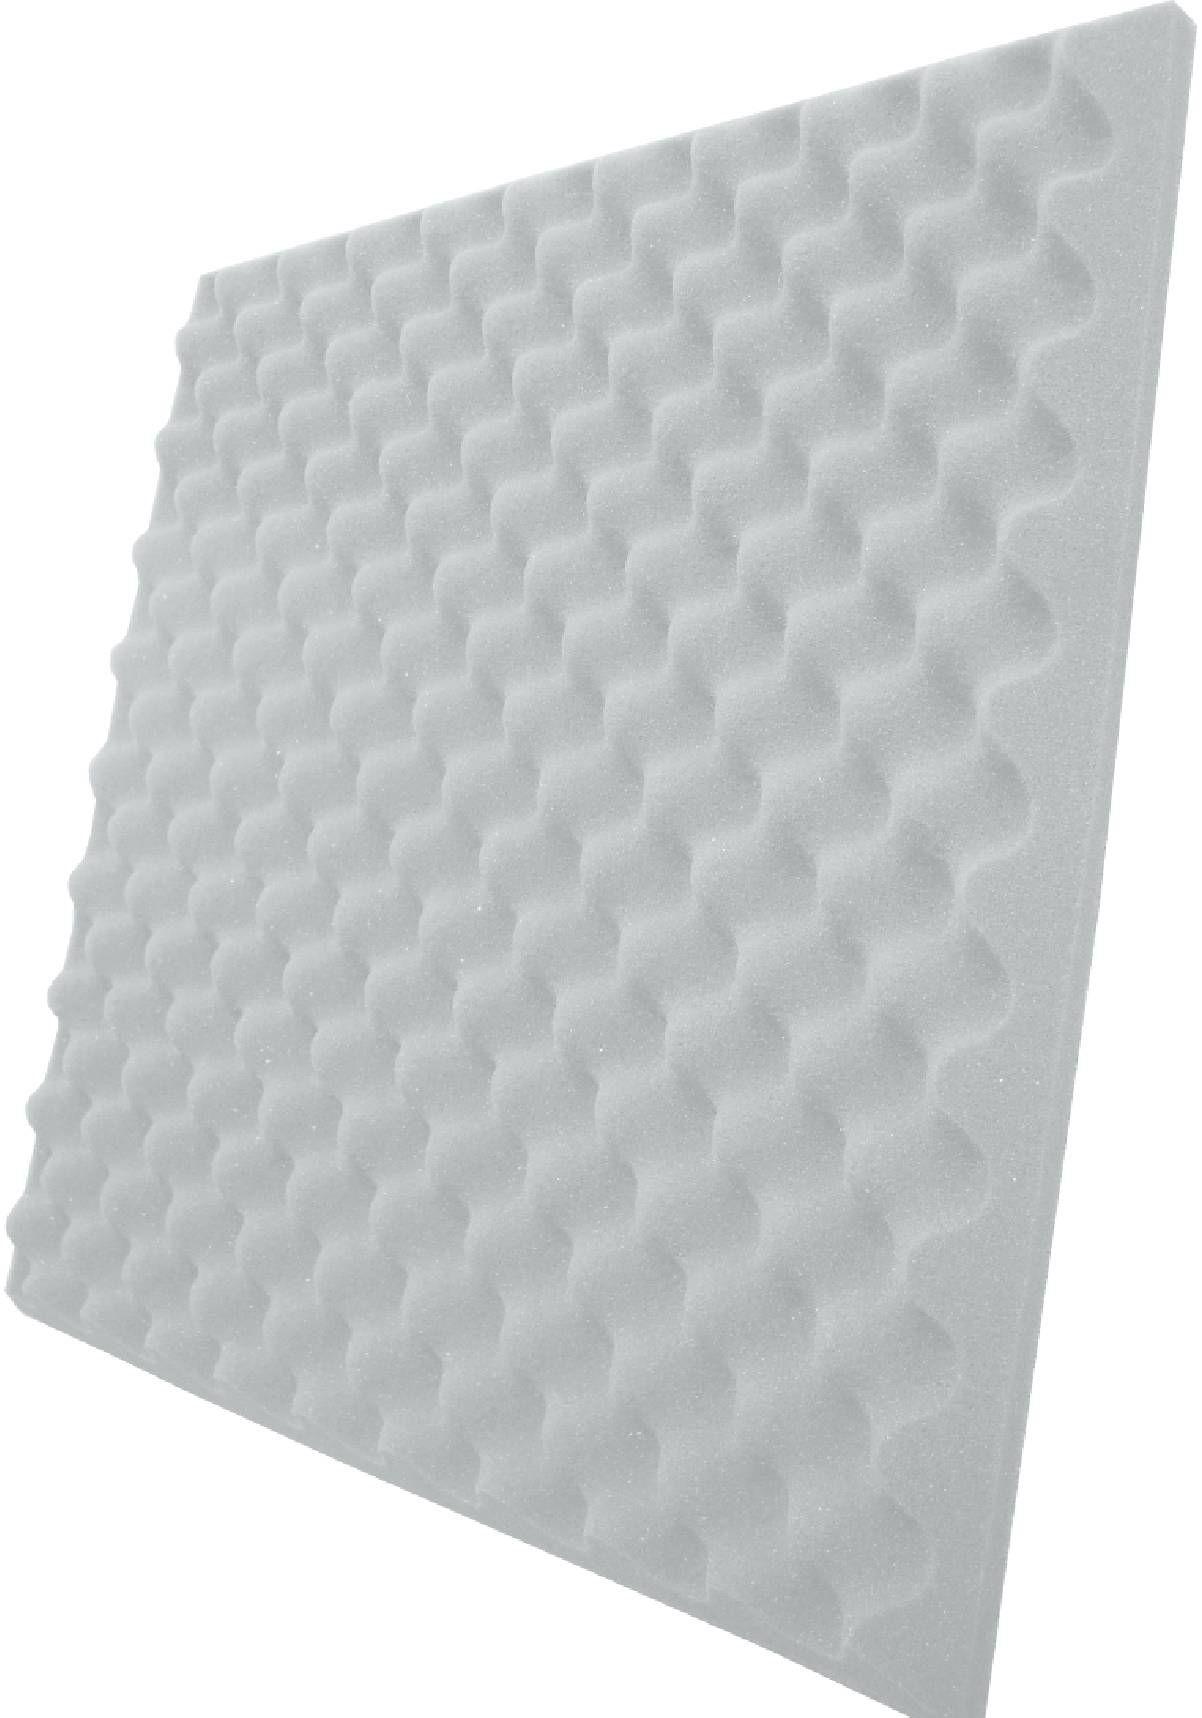 Espuma perfilada - Kit 8 peças - Branco Gelo - 40mm (2m²)  - Loja SPL Acústica